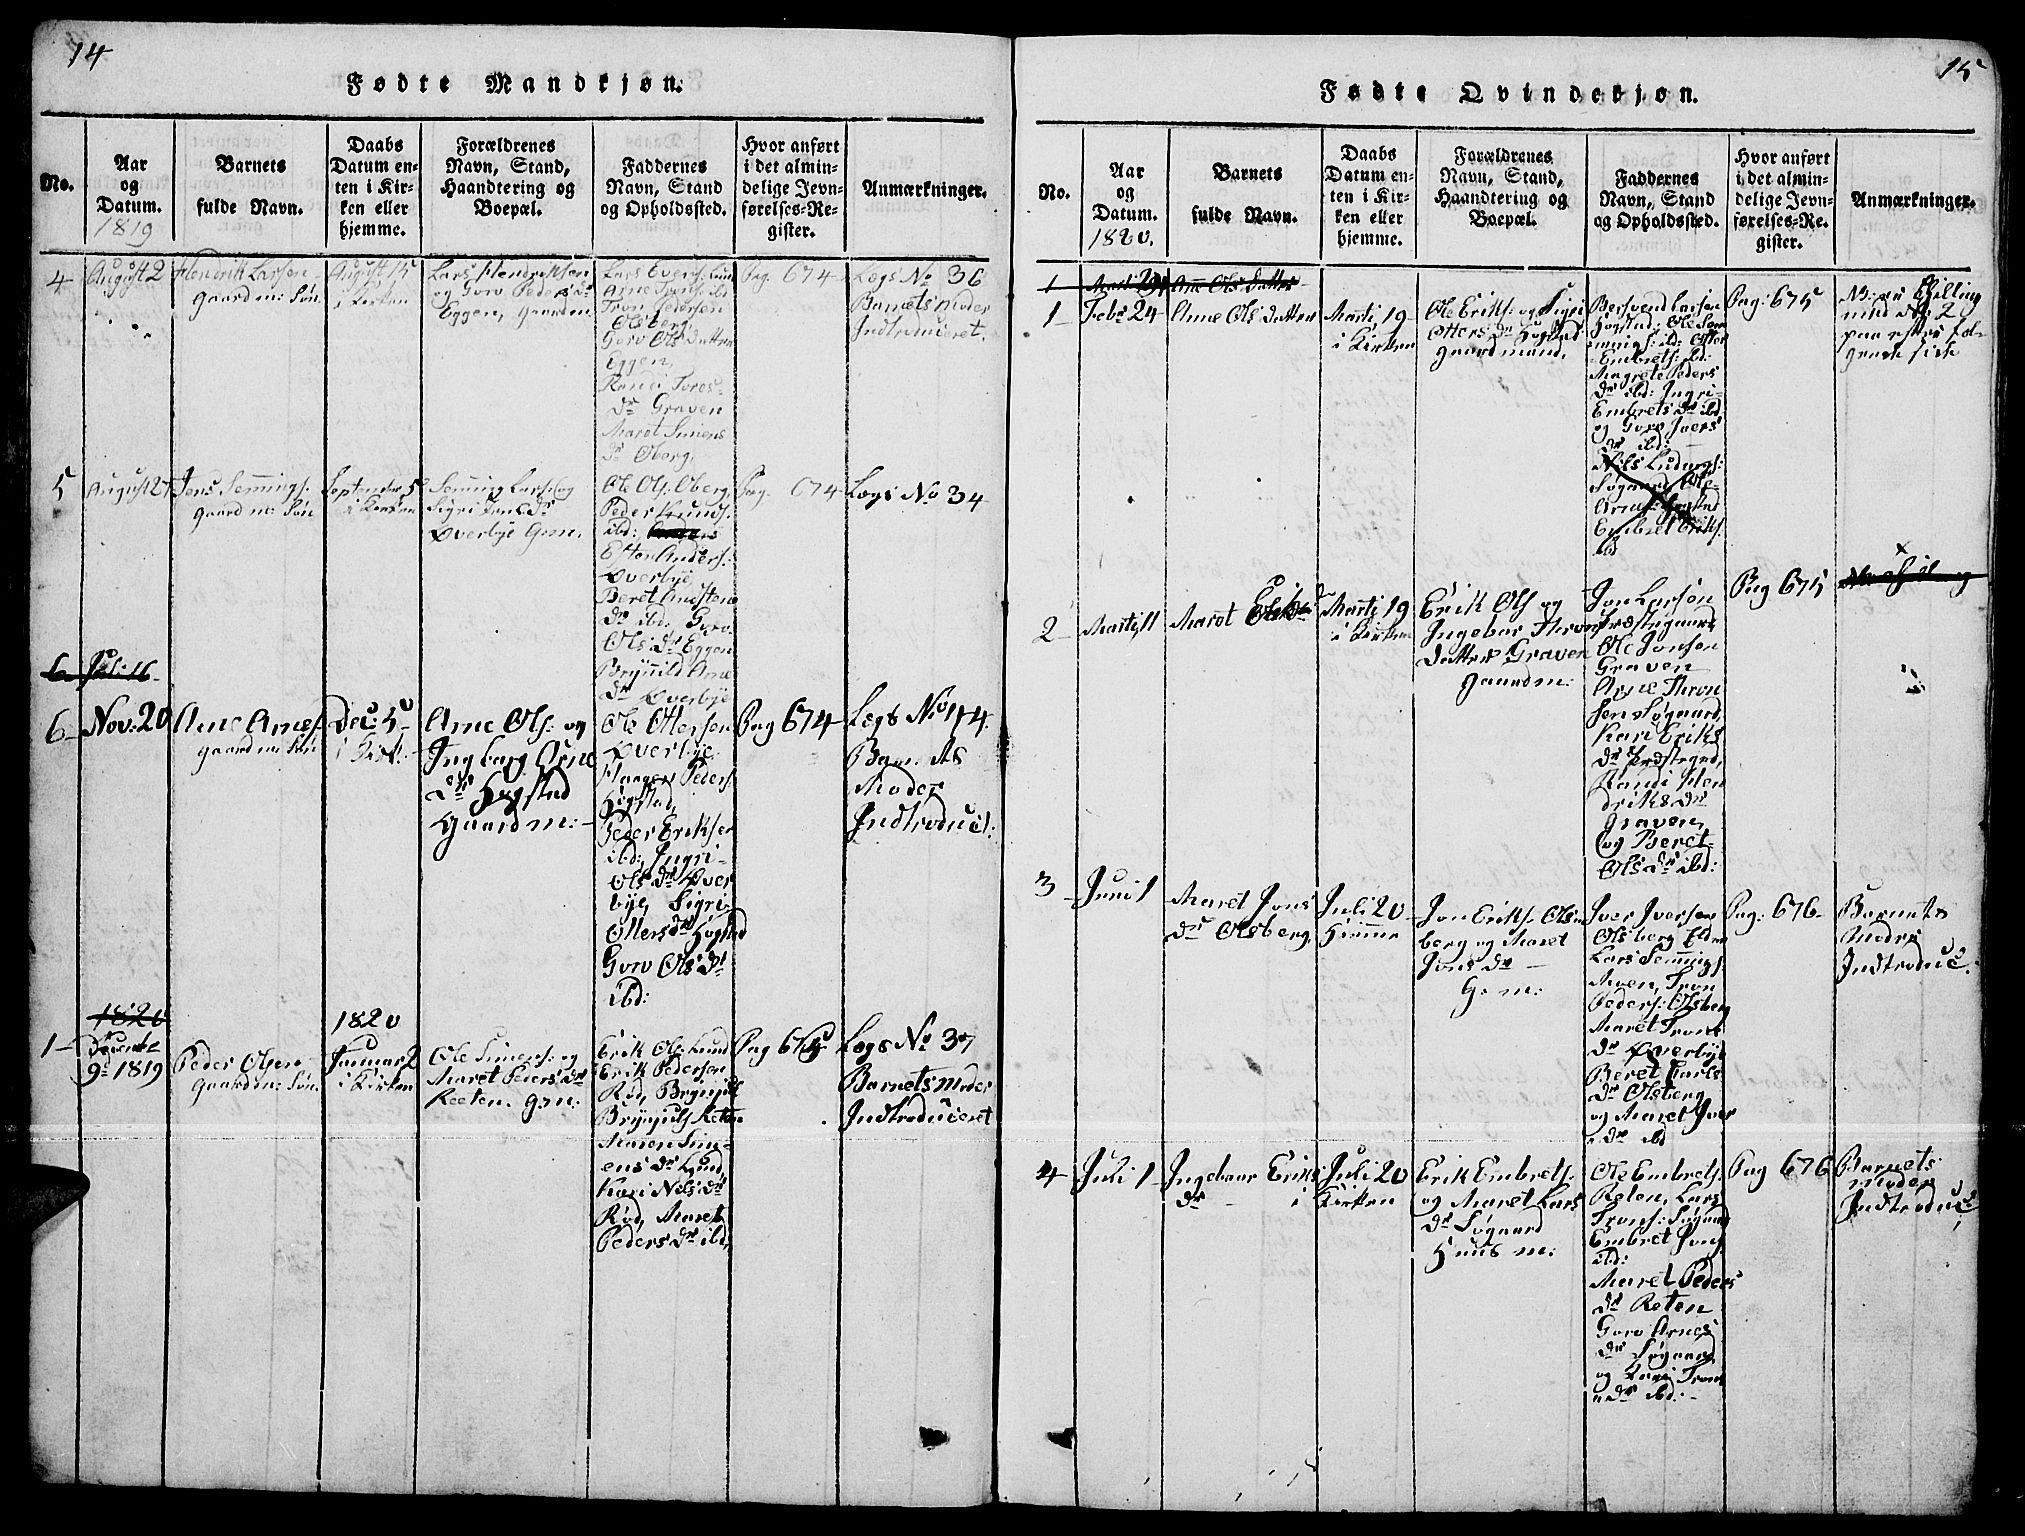 SAH, Tynset prestekontor, Klokkerbok nr. 4, 1814-1879, s. 14-15